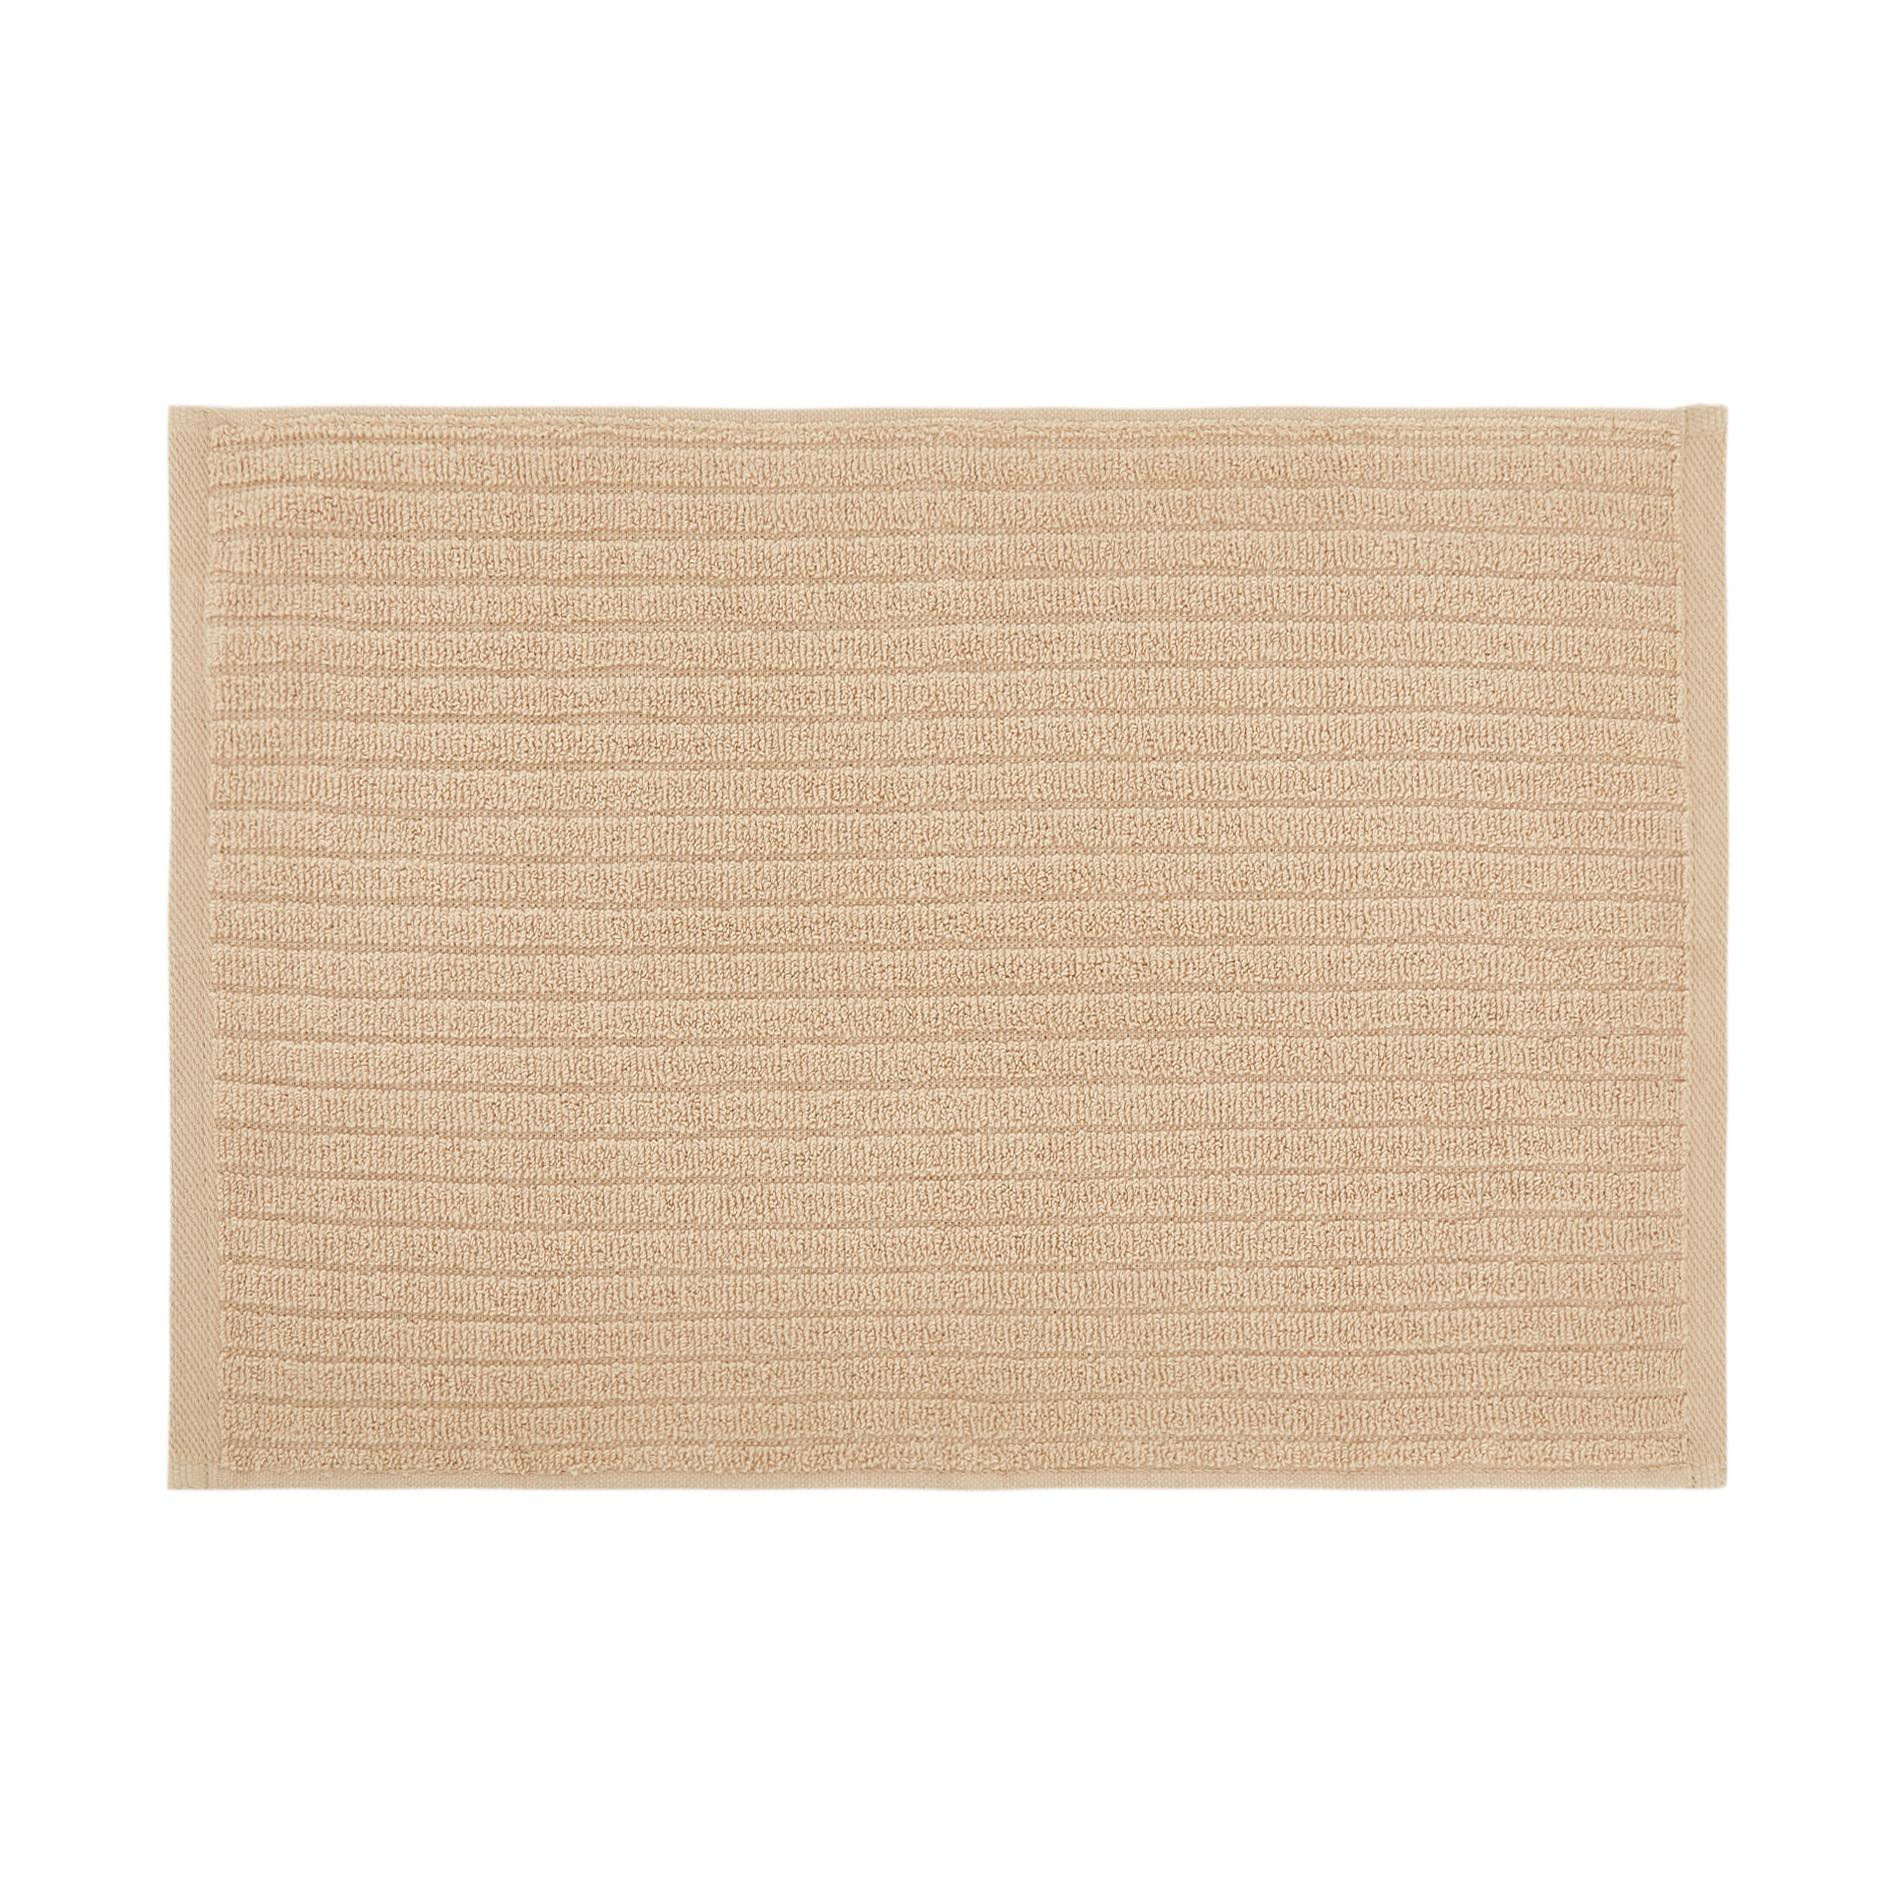 Set asciugamani puro cotone righe jacquard tinta unita, Beige, large image number 2